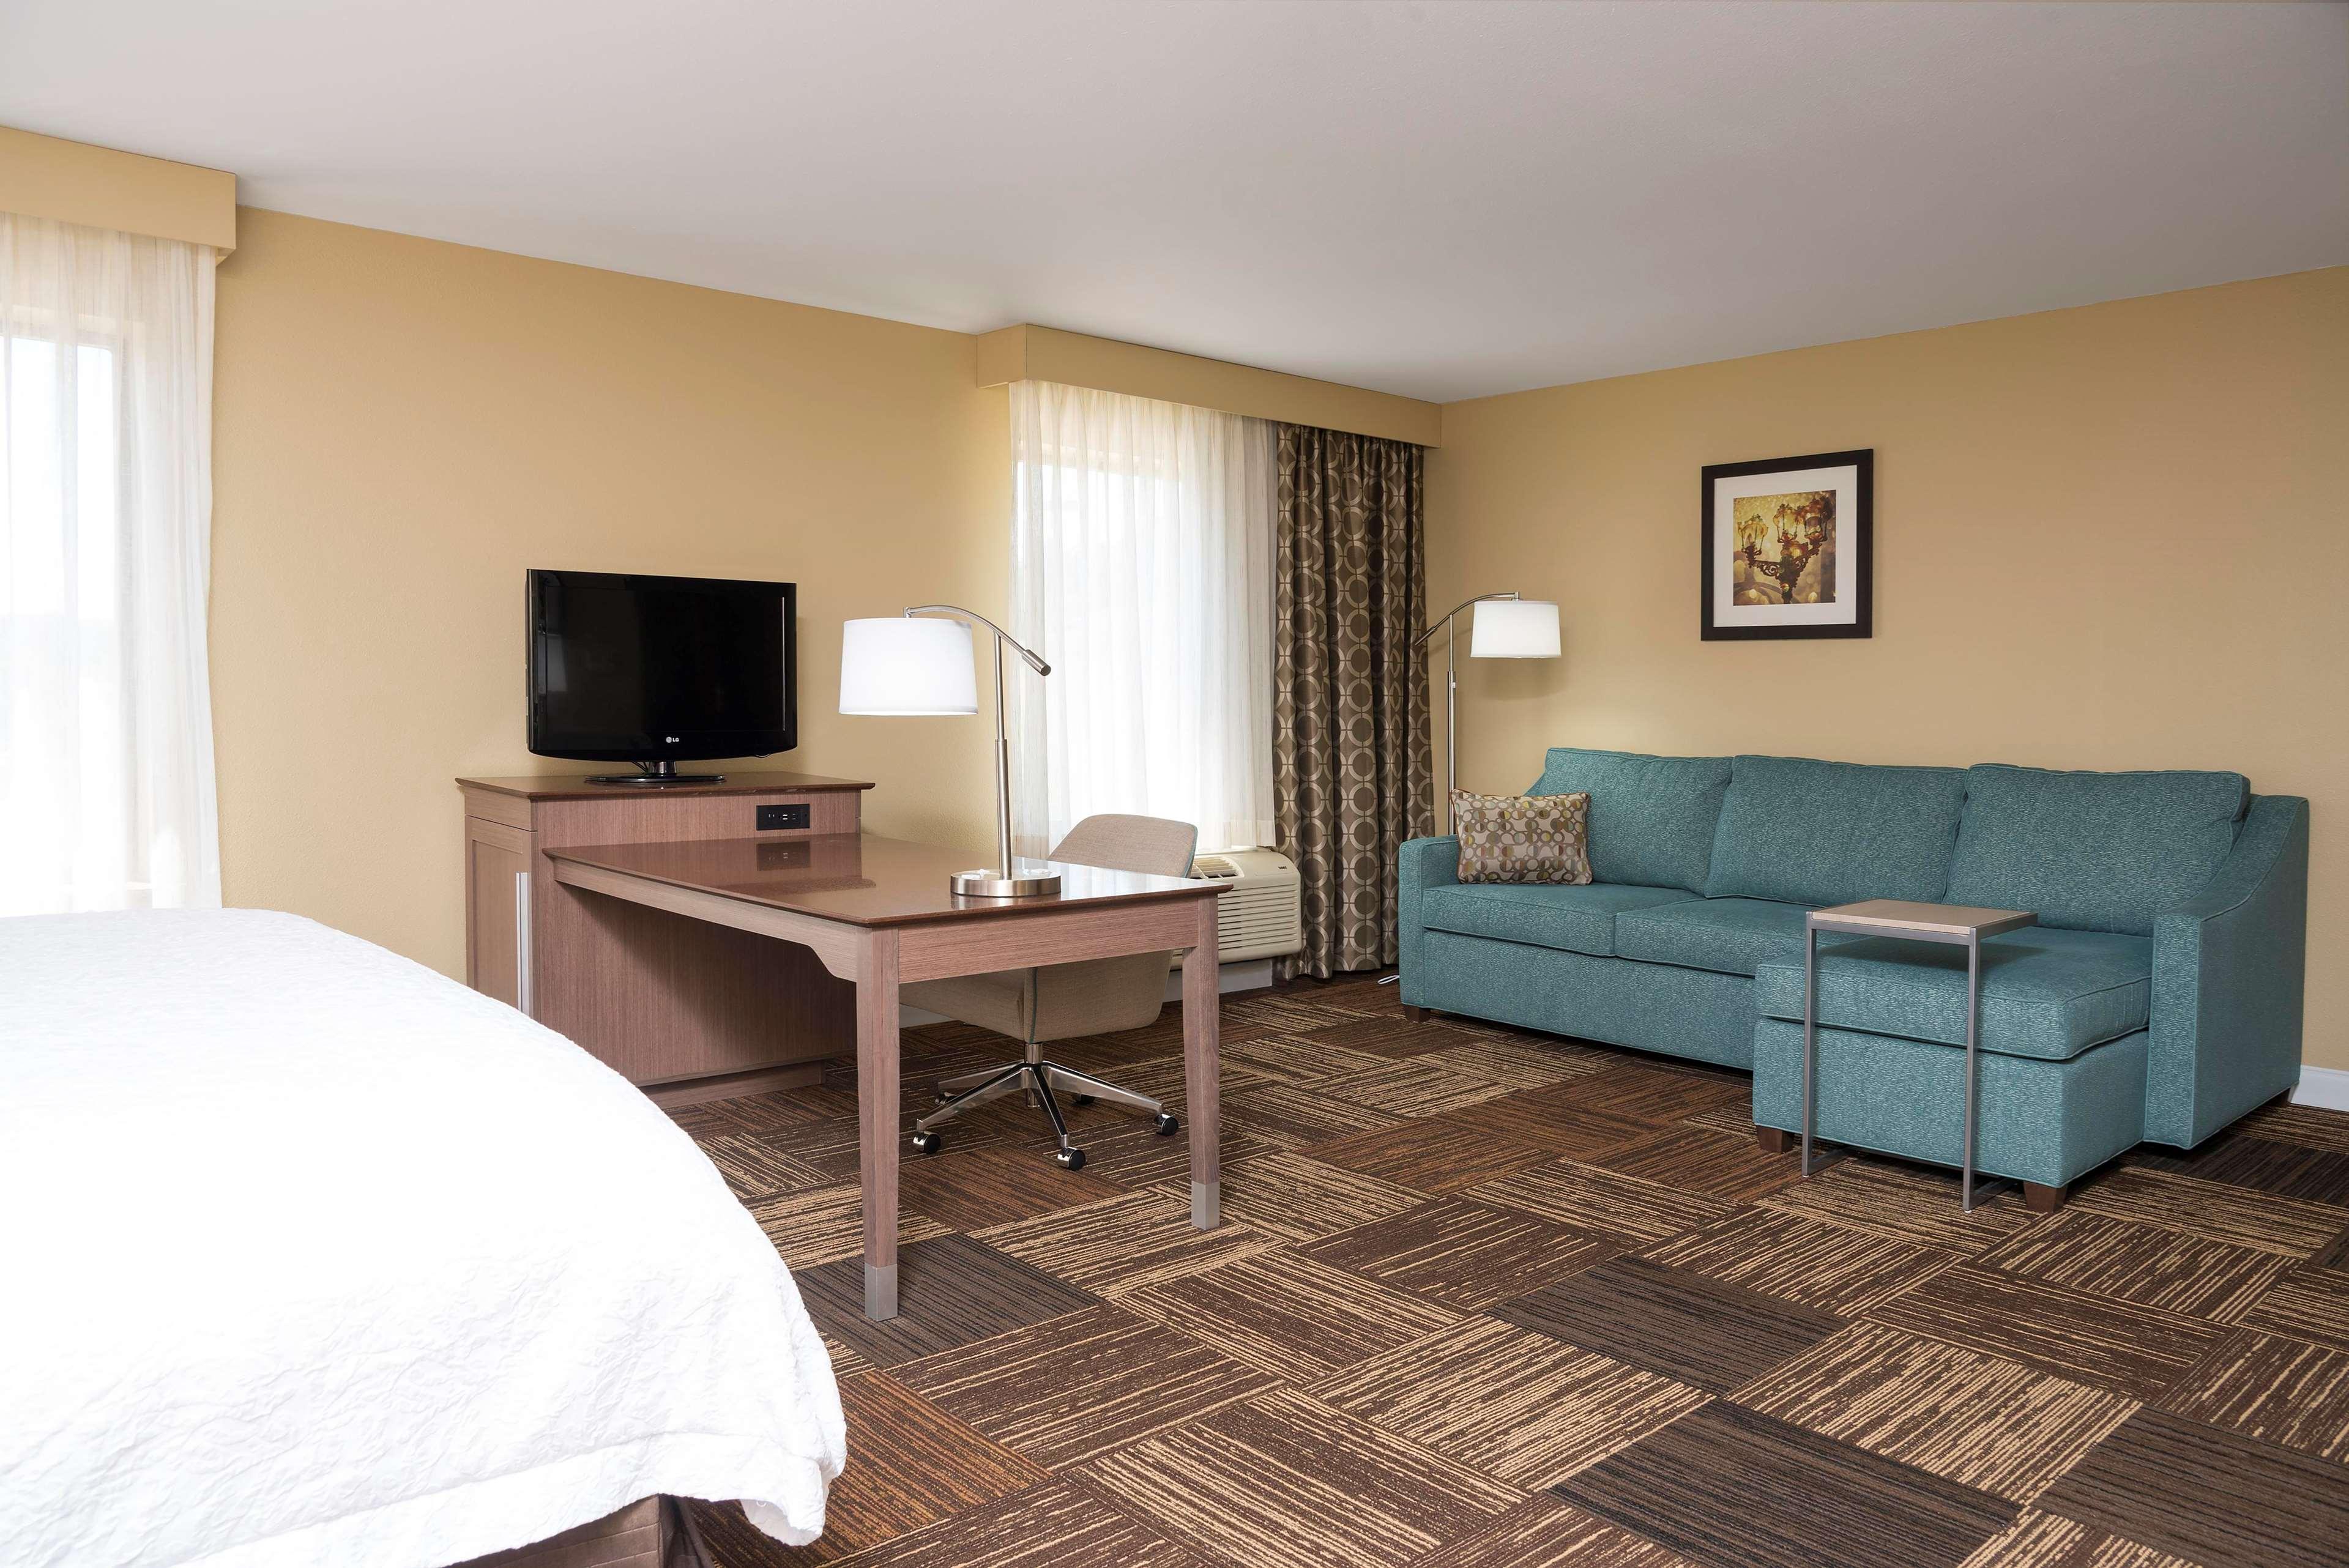 Hampton Inn & Suites Mansfield-South @ I-71 image 18